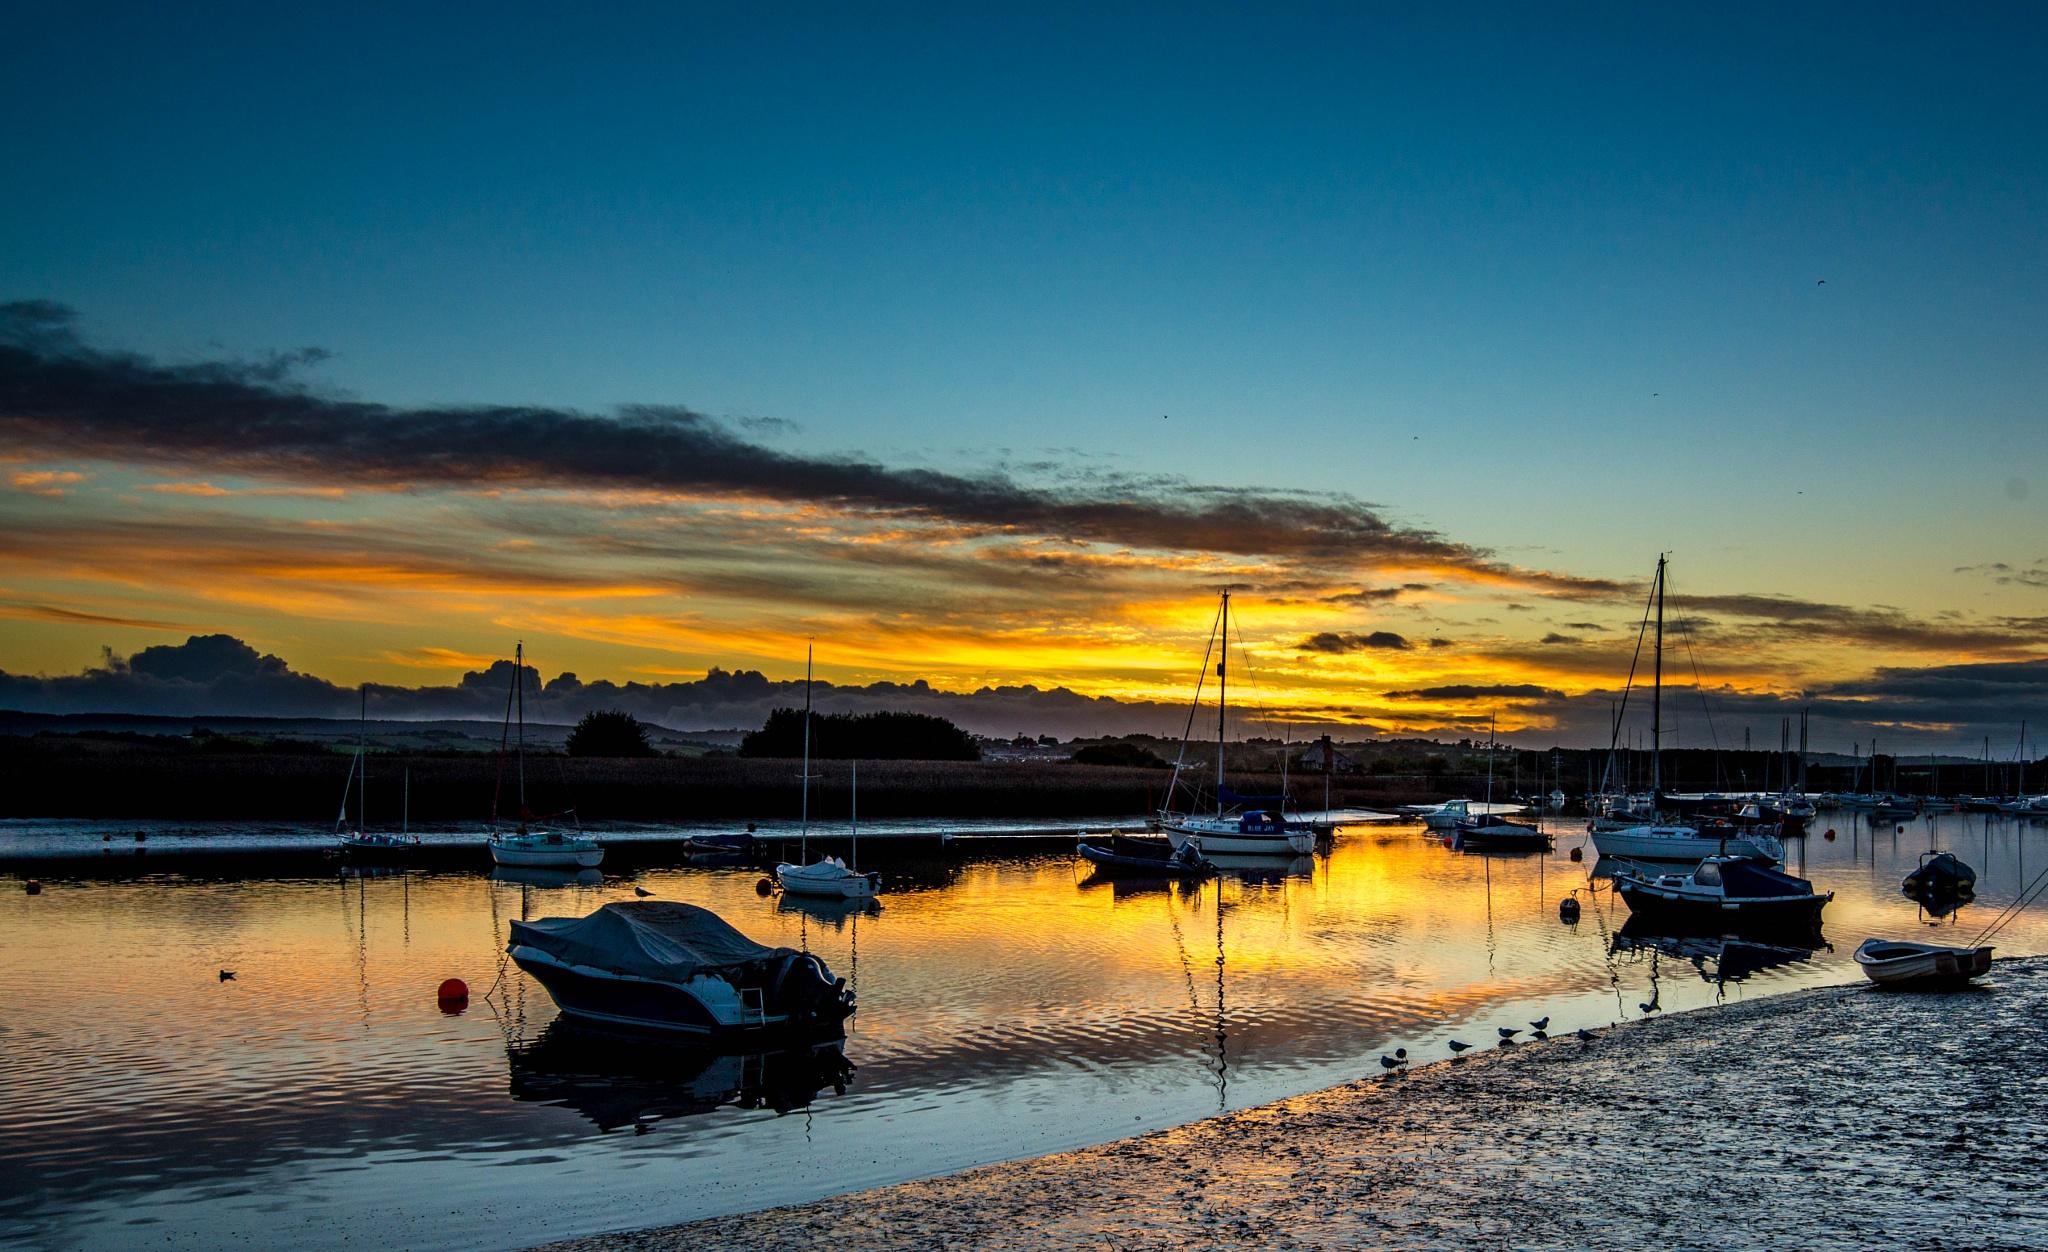 Topsham quay sunset by Hammond Photography